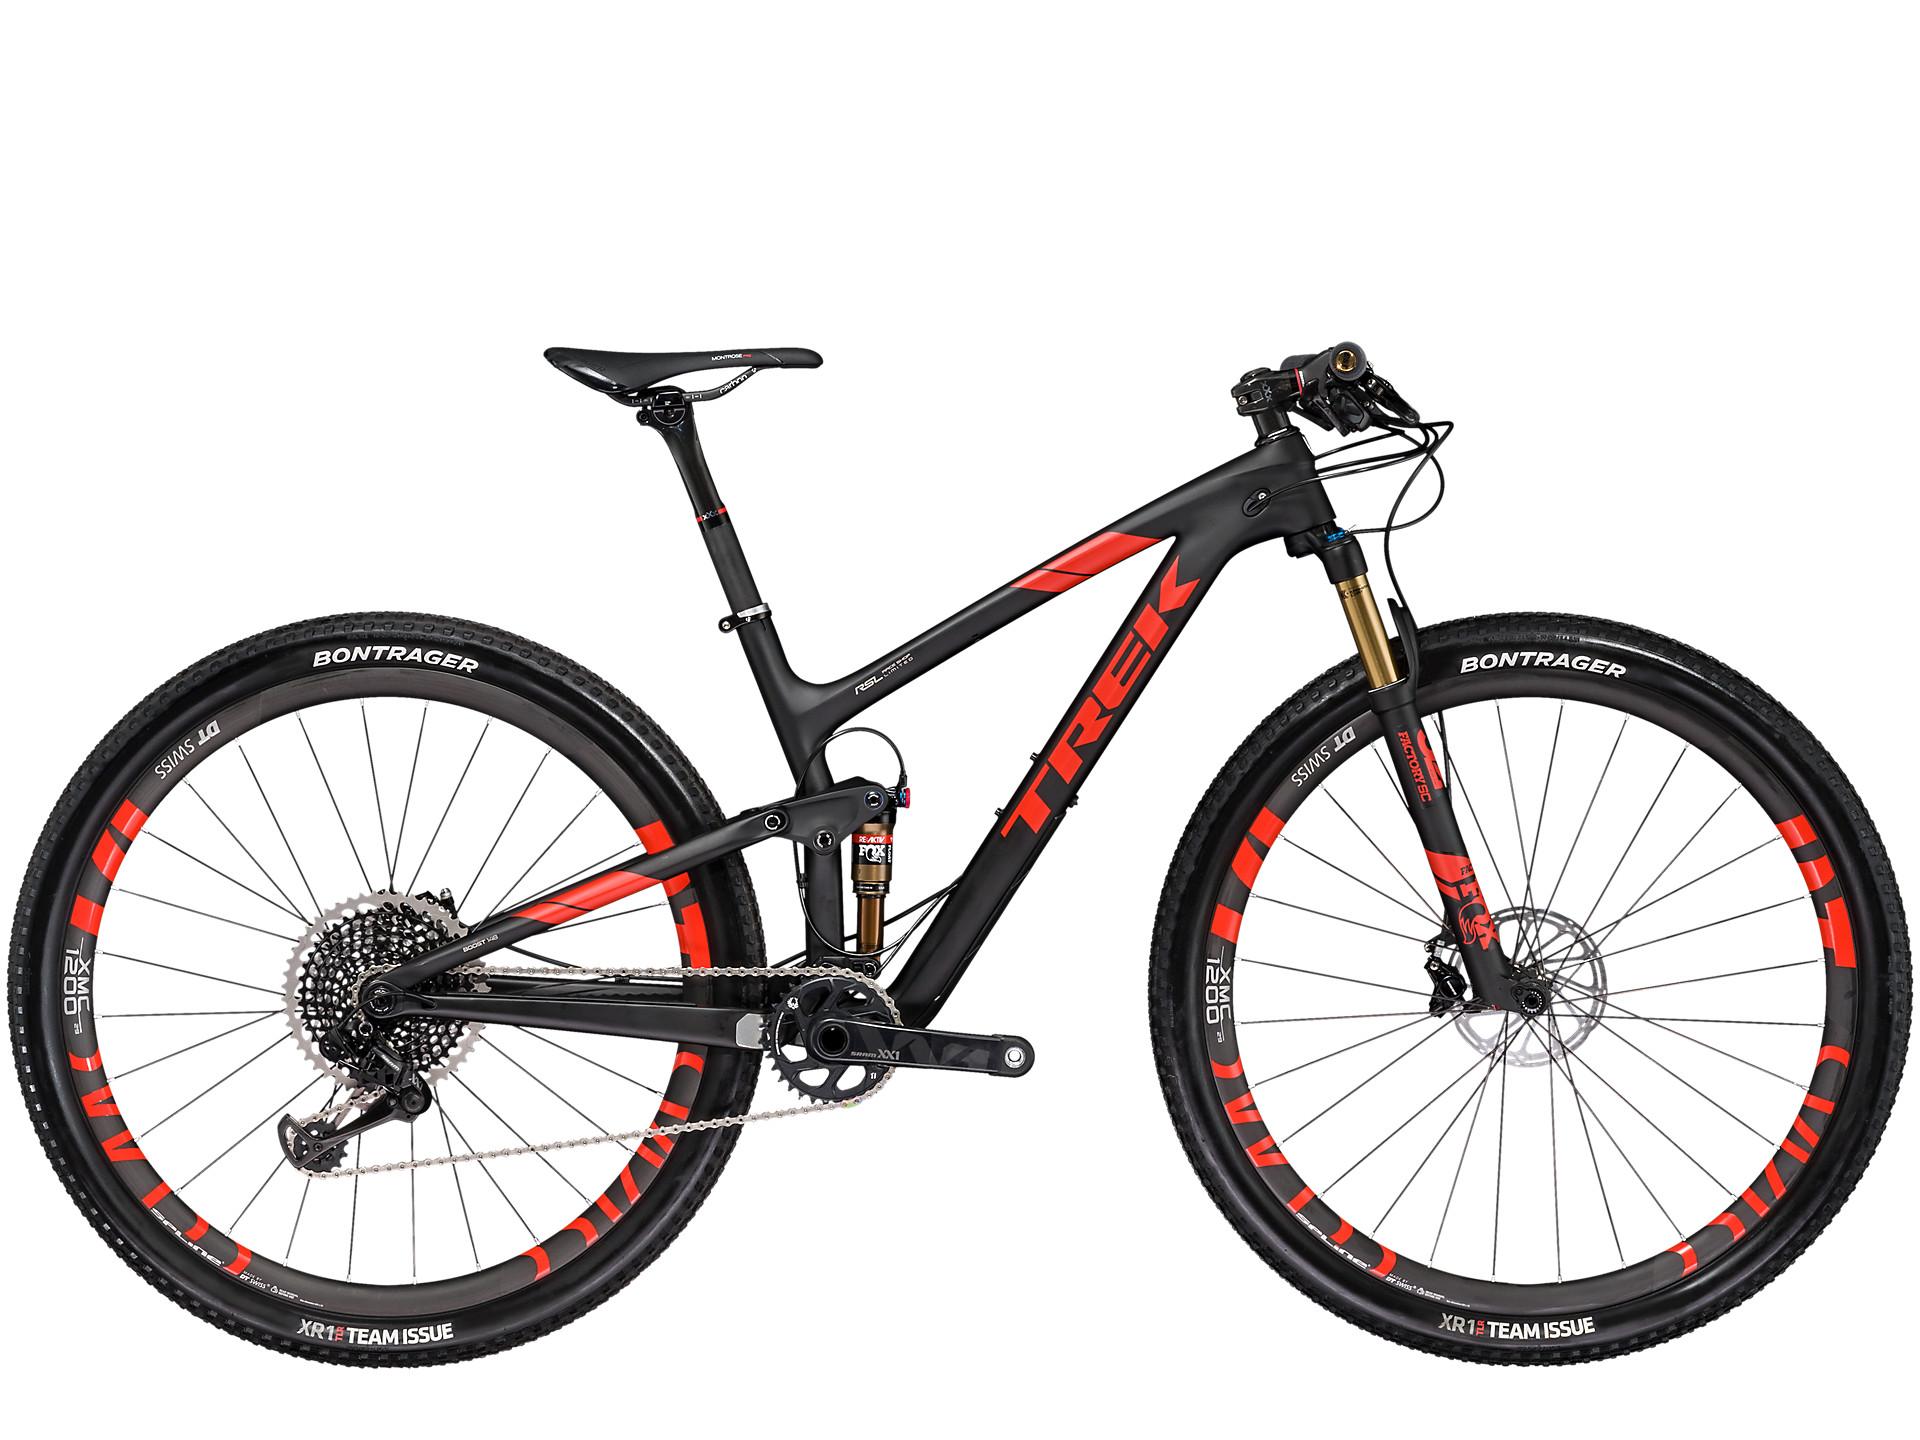 965ff91f835 Top Fuel 9.9 Race Shop Limited | Trek Bikes (ZA)